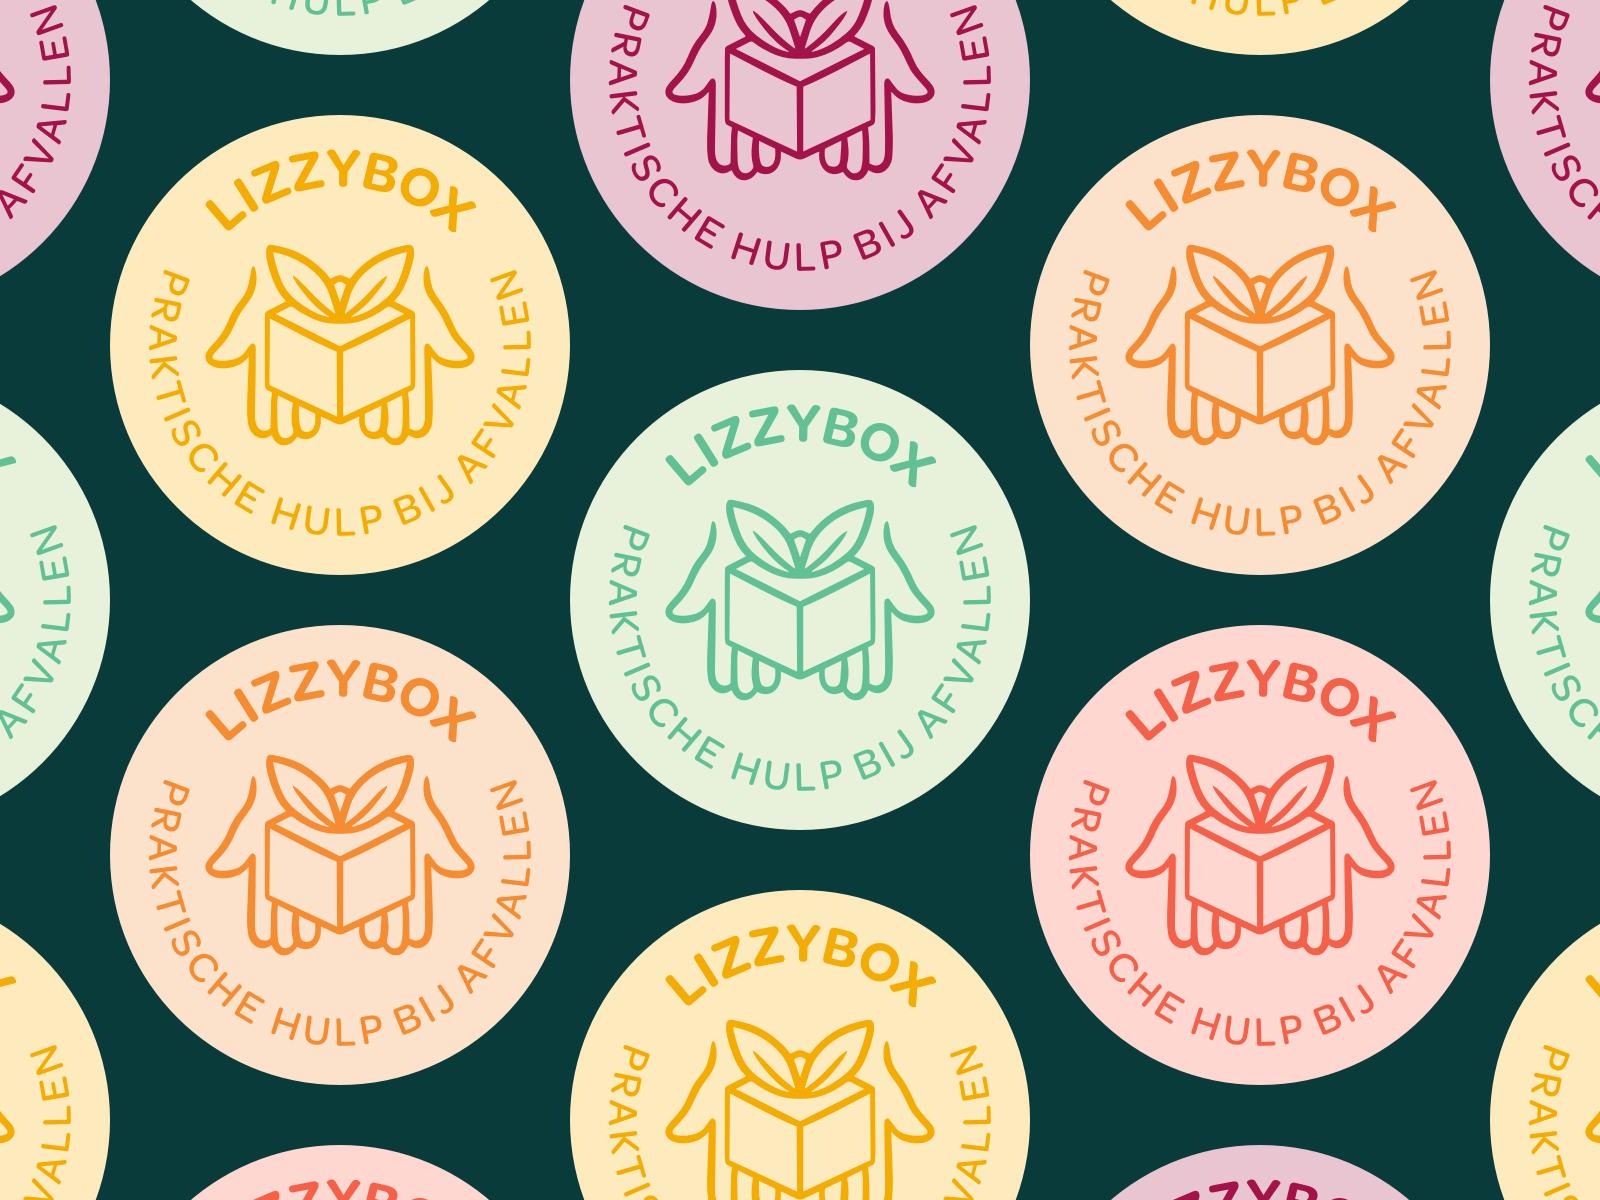 Lizzybox Branding: Logo badge